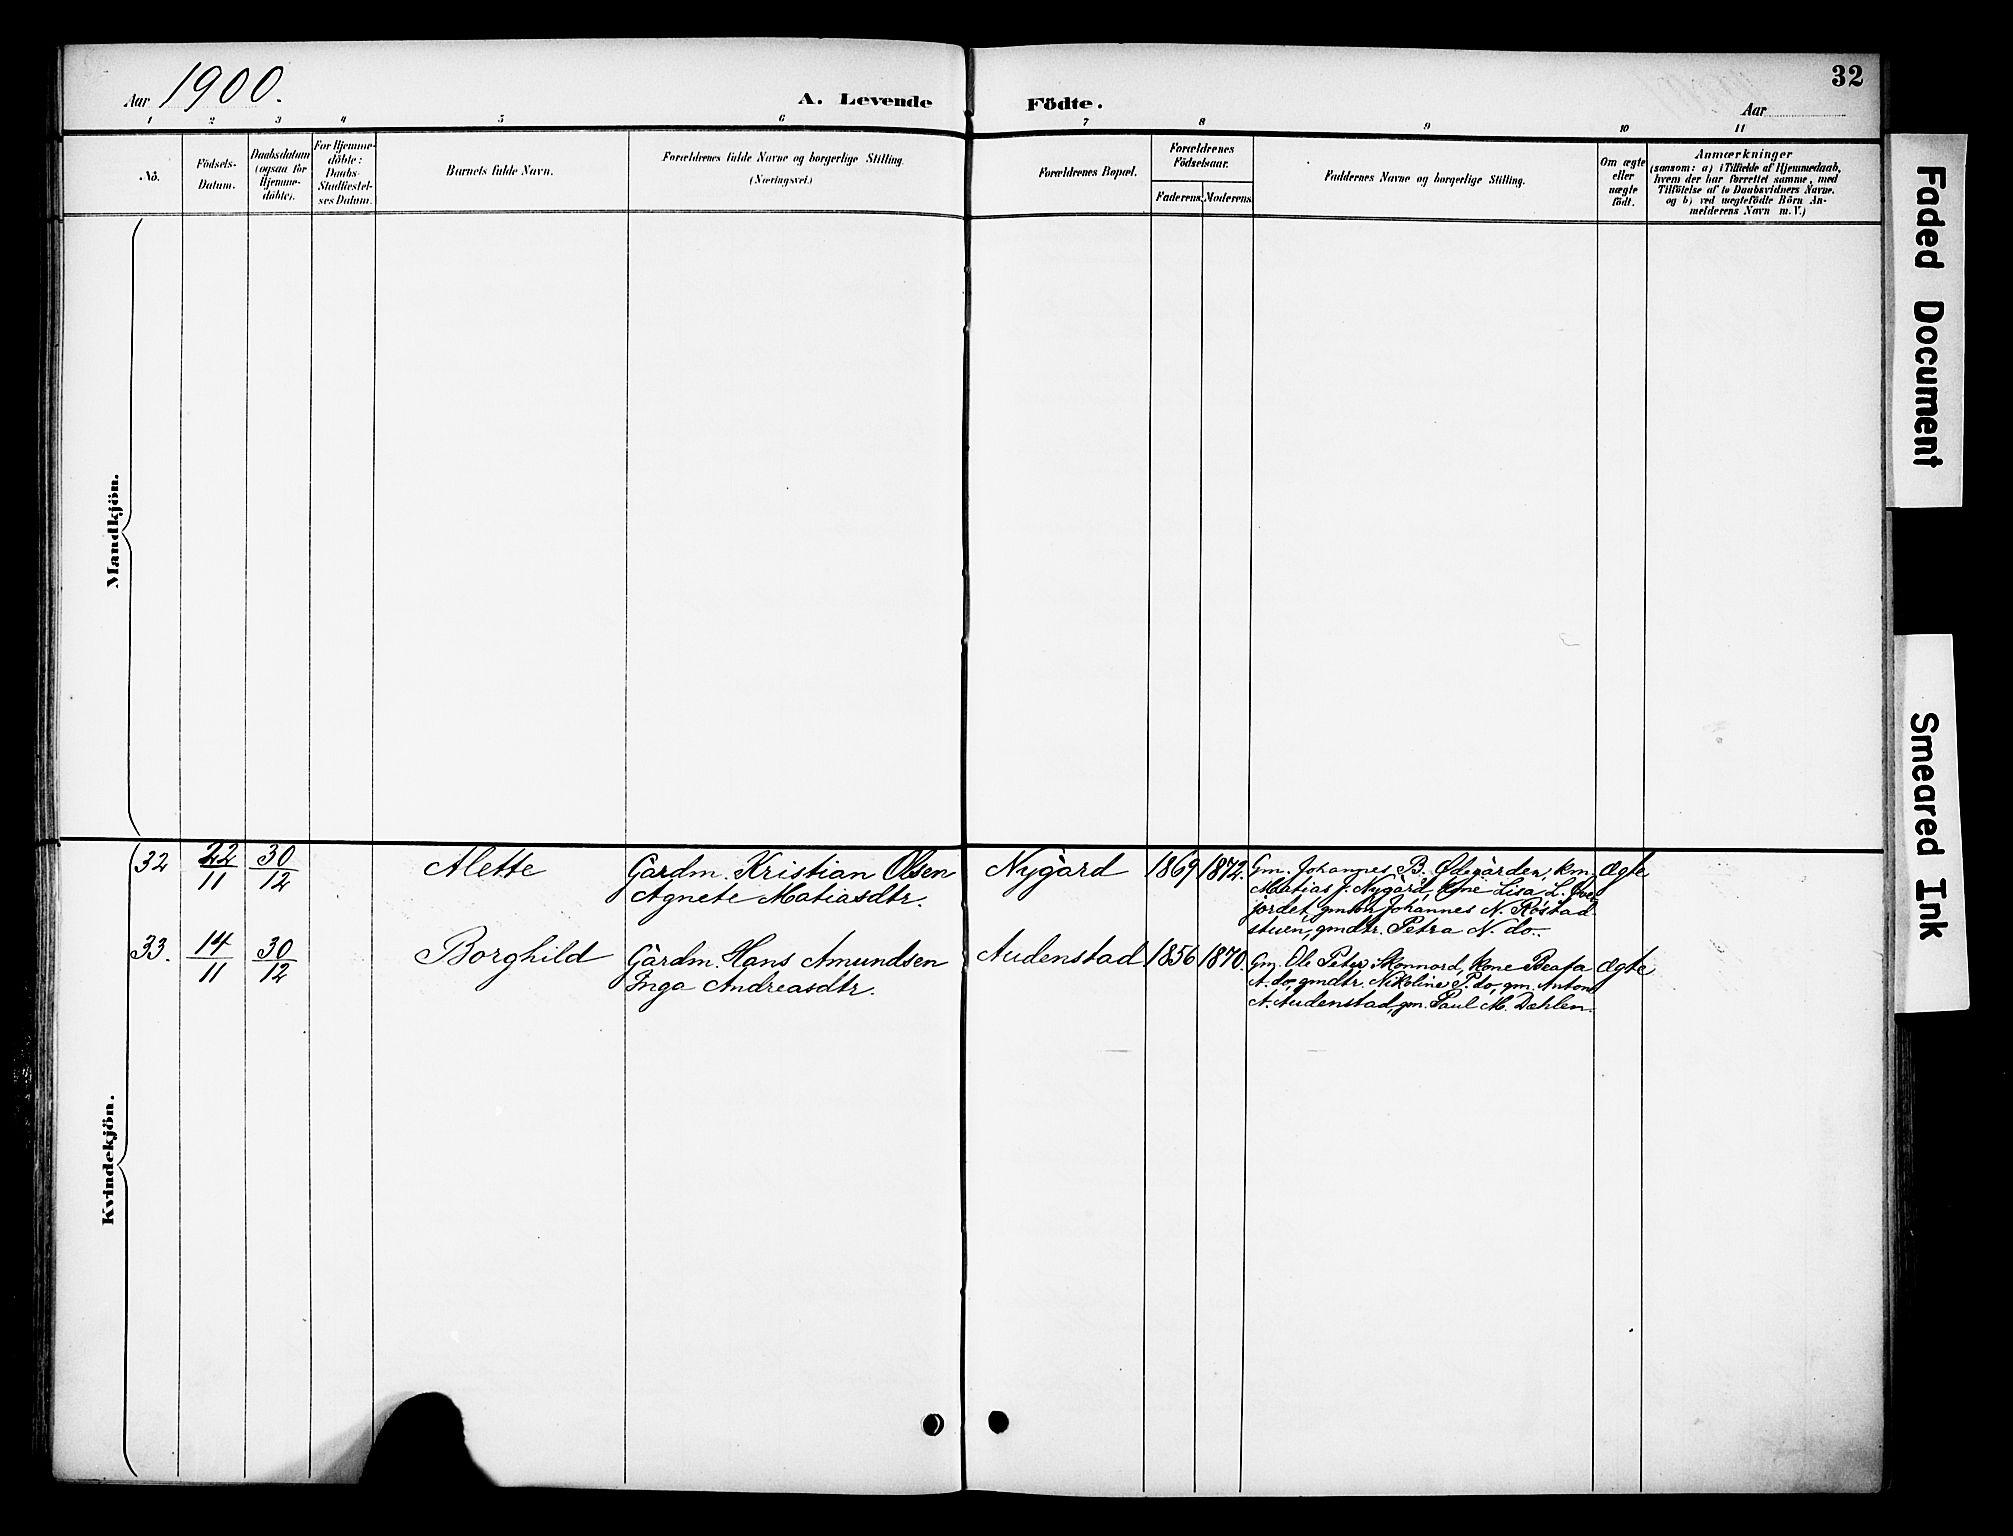 SAH, Biri prestekontor, Ministerialbok nr. 8, 1894-1901, s. 32